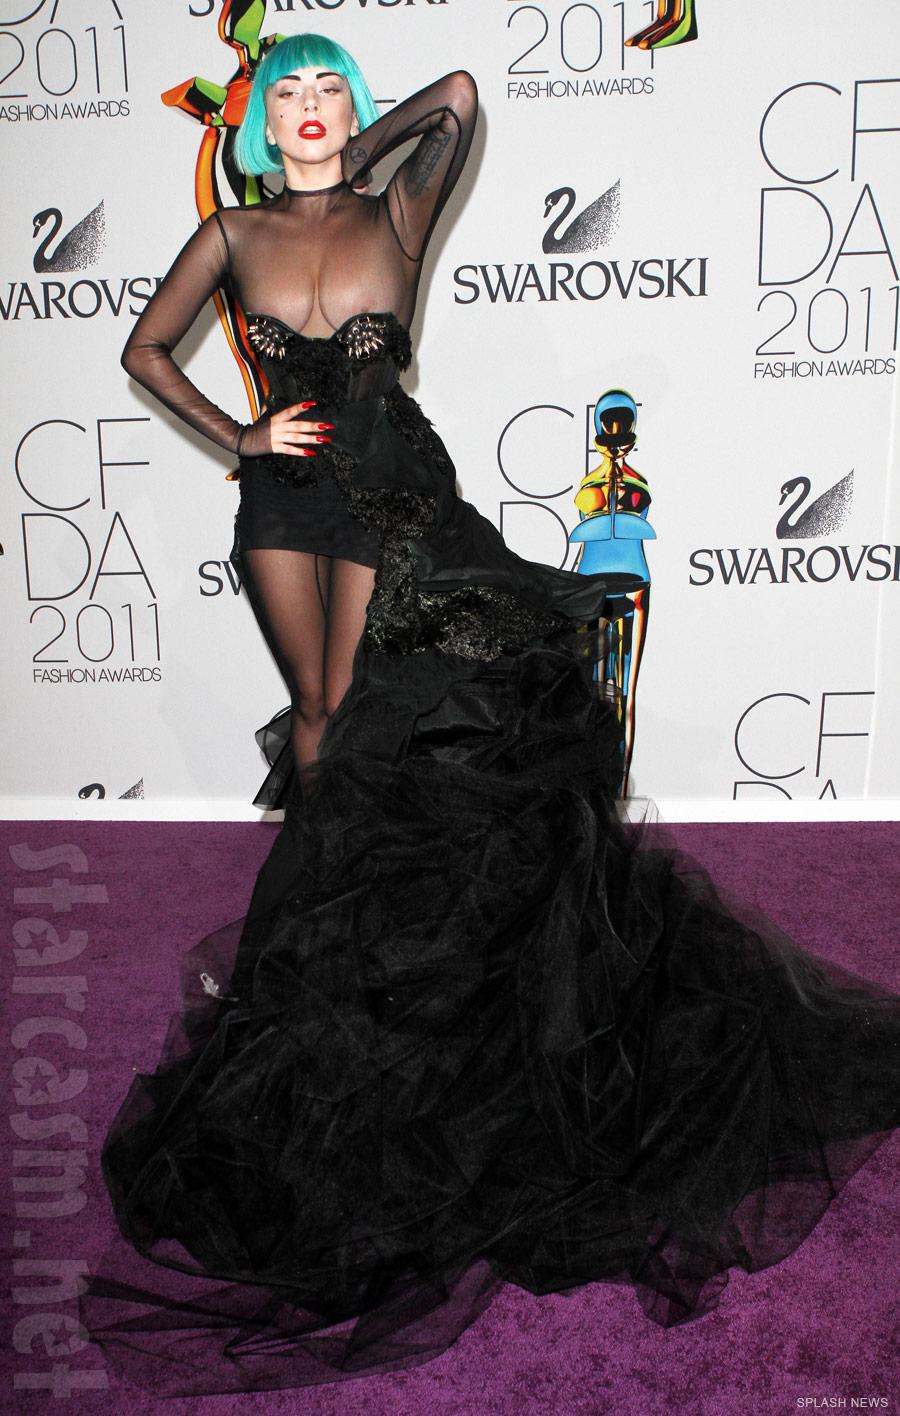 Peep This: Coco T's Fashion Week Nip Slip On Tape (NSFW) | VIBE